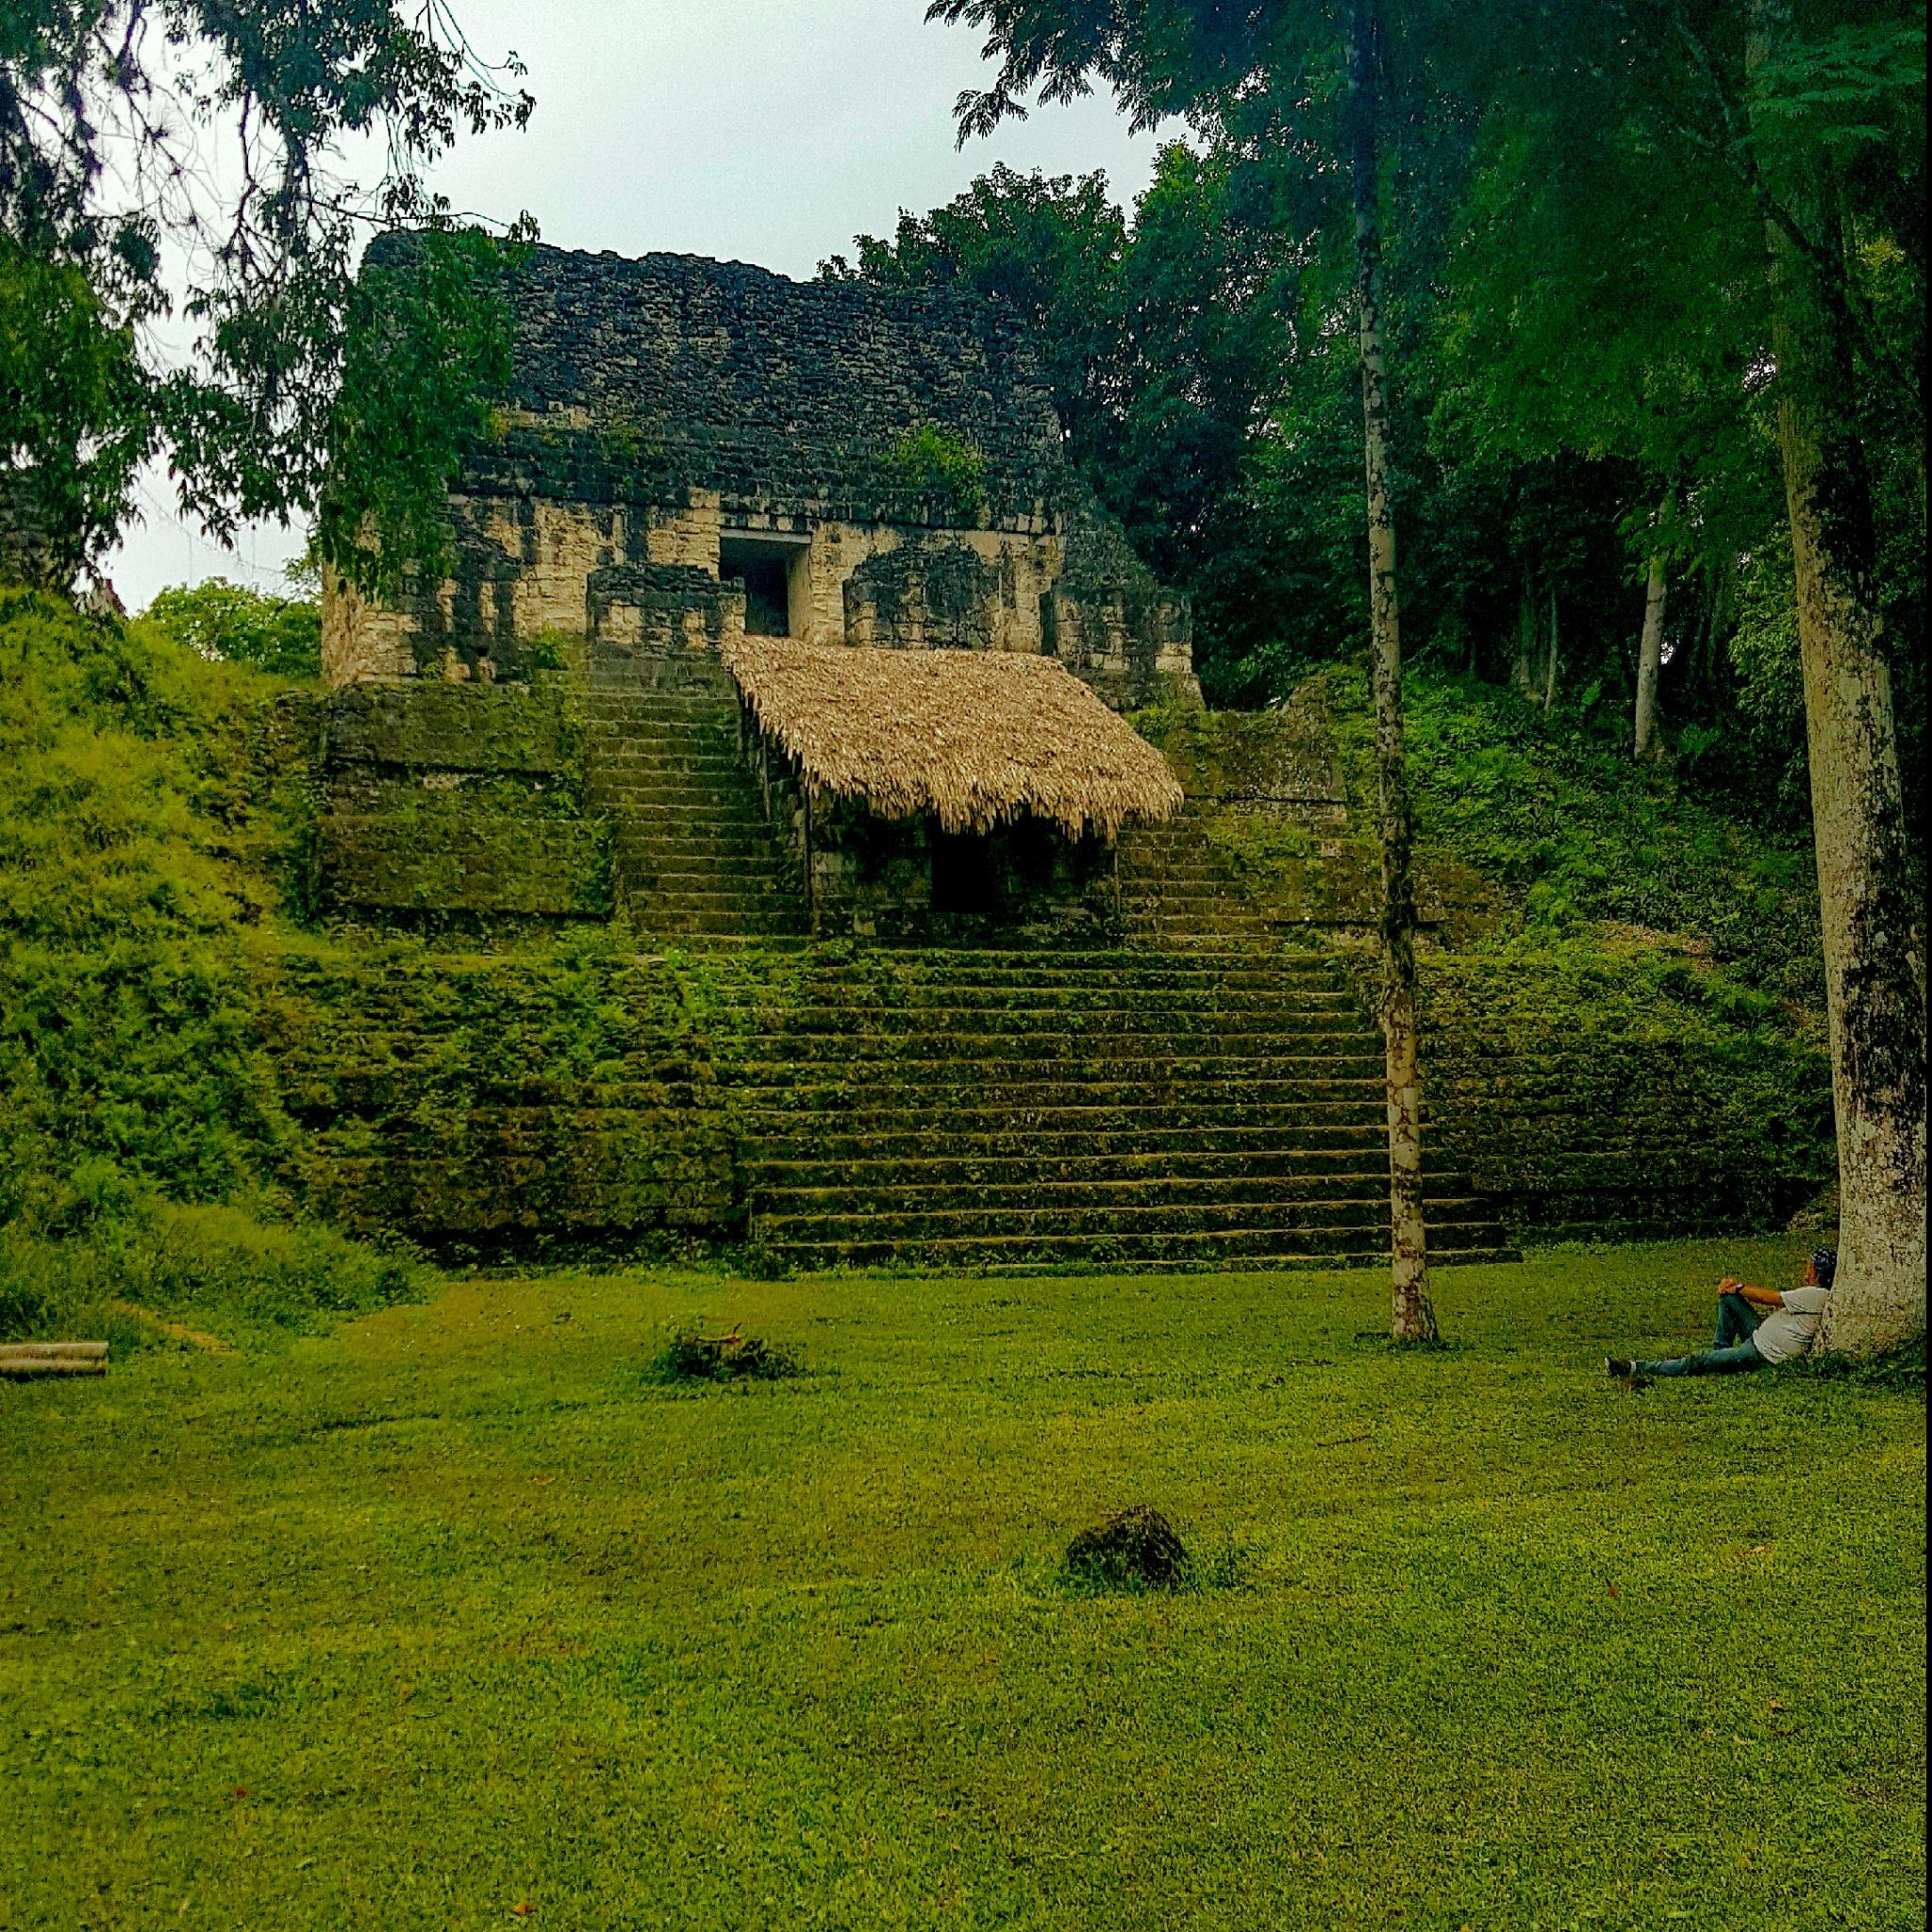 Mayan ruins (Tikal, Guatemala) Adobe_20190310_100654LRM_EXPORT_410680486005414_20190310_100432550